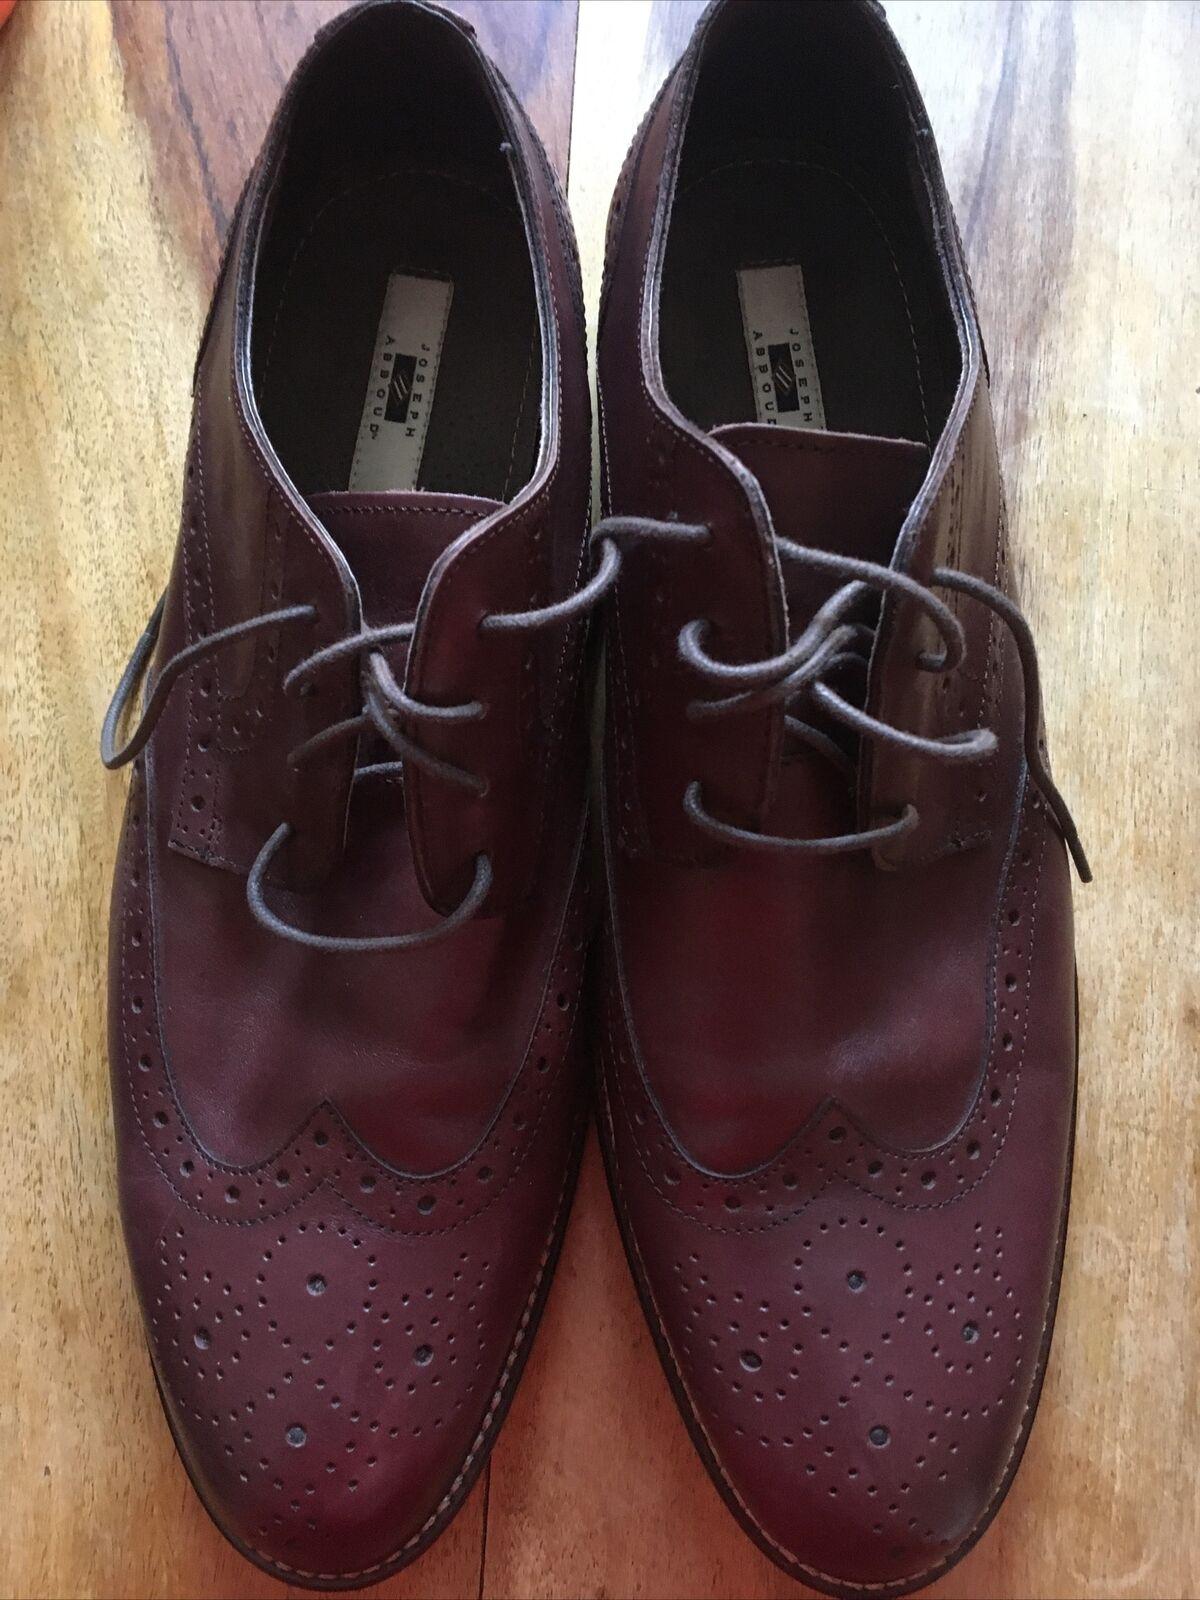 Joseph Abboud Men's Sz 12 Leather Oxford Dress Shoes Tried On Once